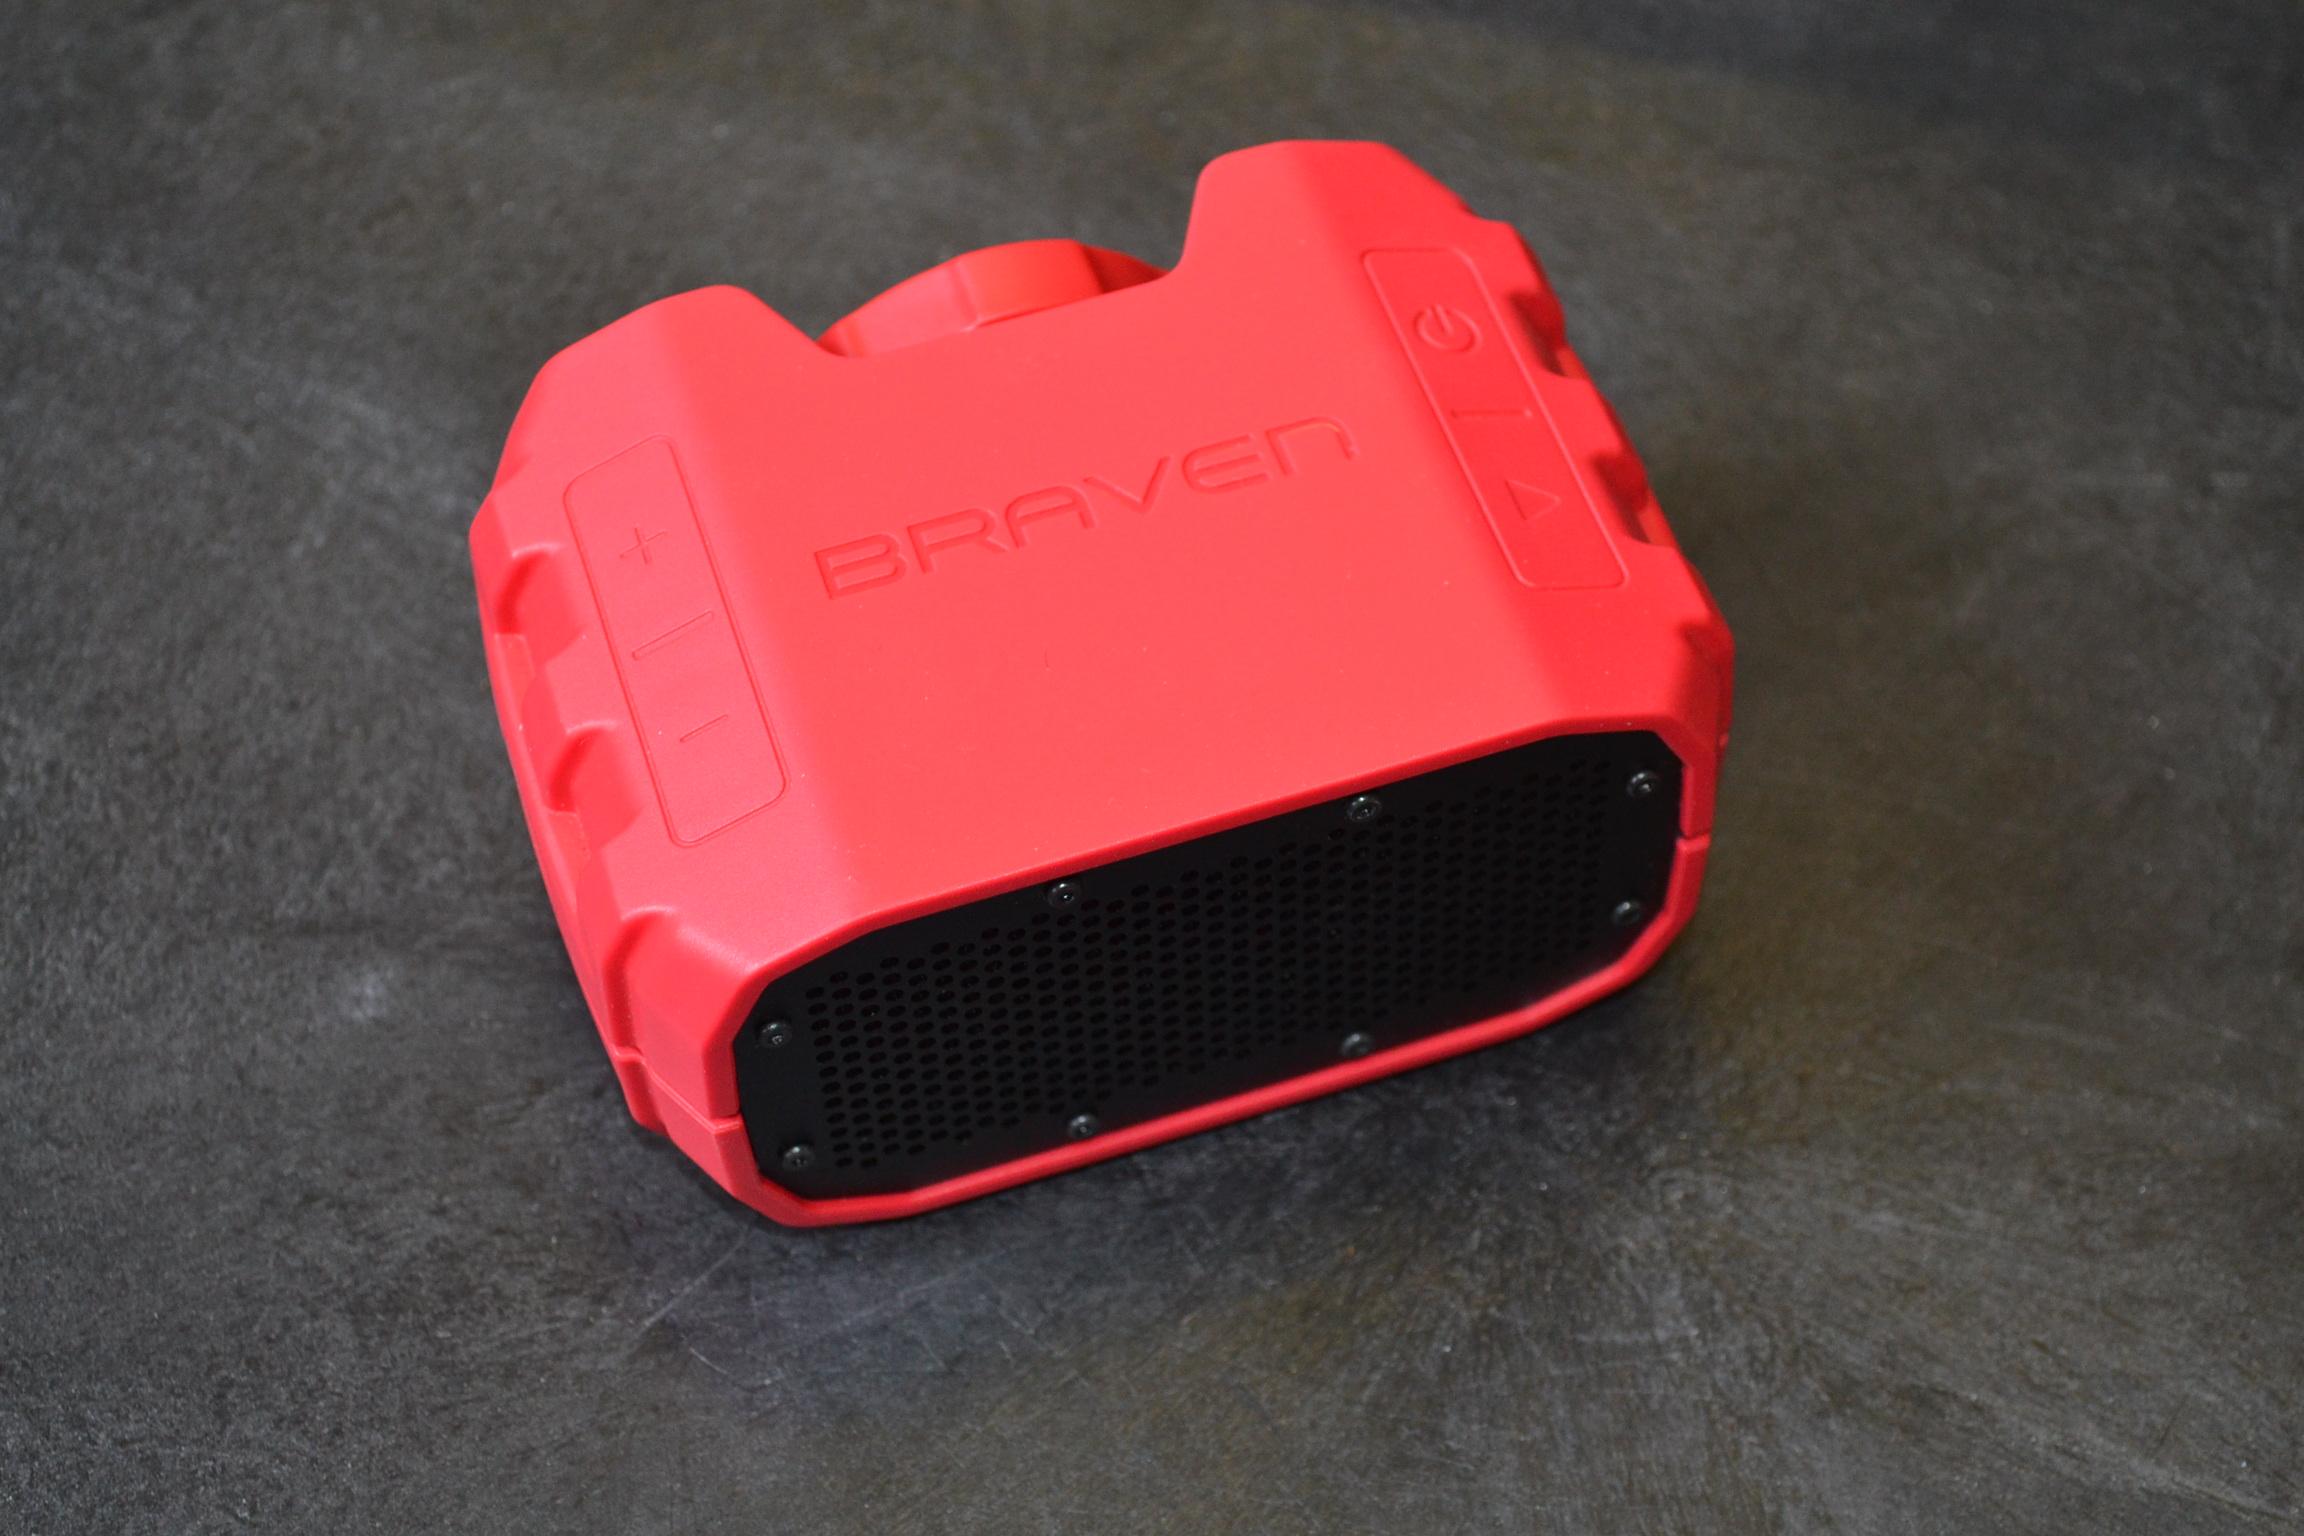 Braven BRV-1 Portable Wireless Bluetooth Speaker 12 Hourswaterproof Built-In 140